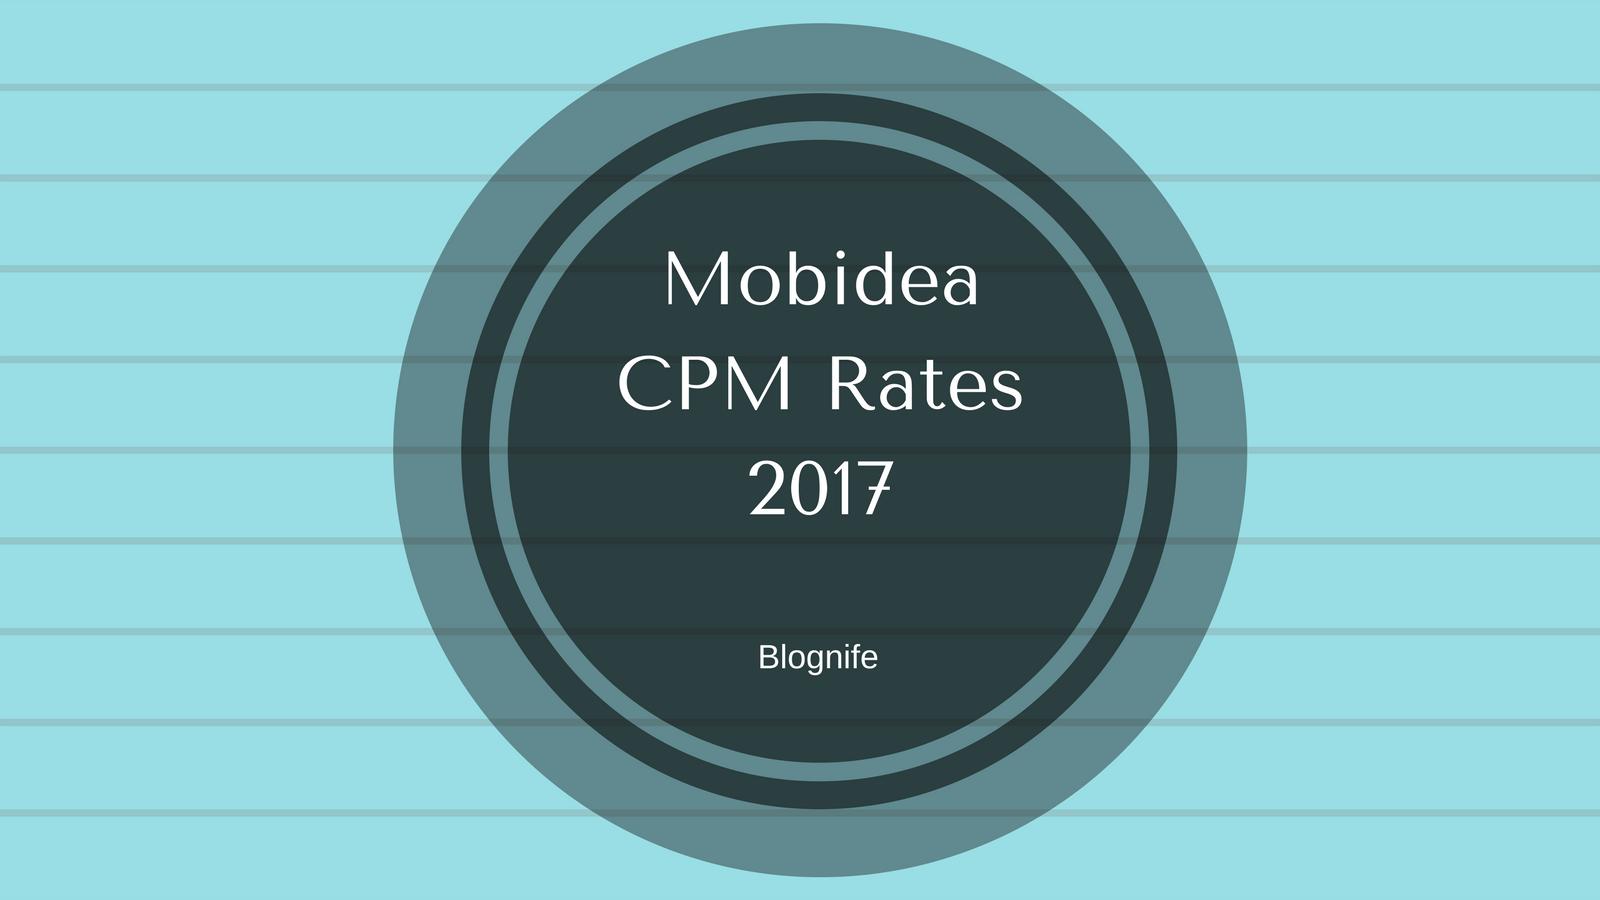 Mobidea CPM Rates 2019